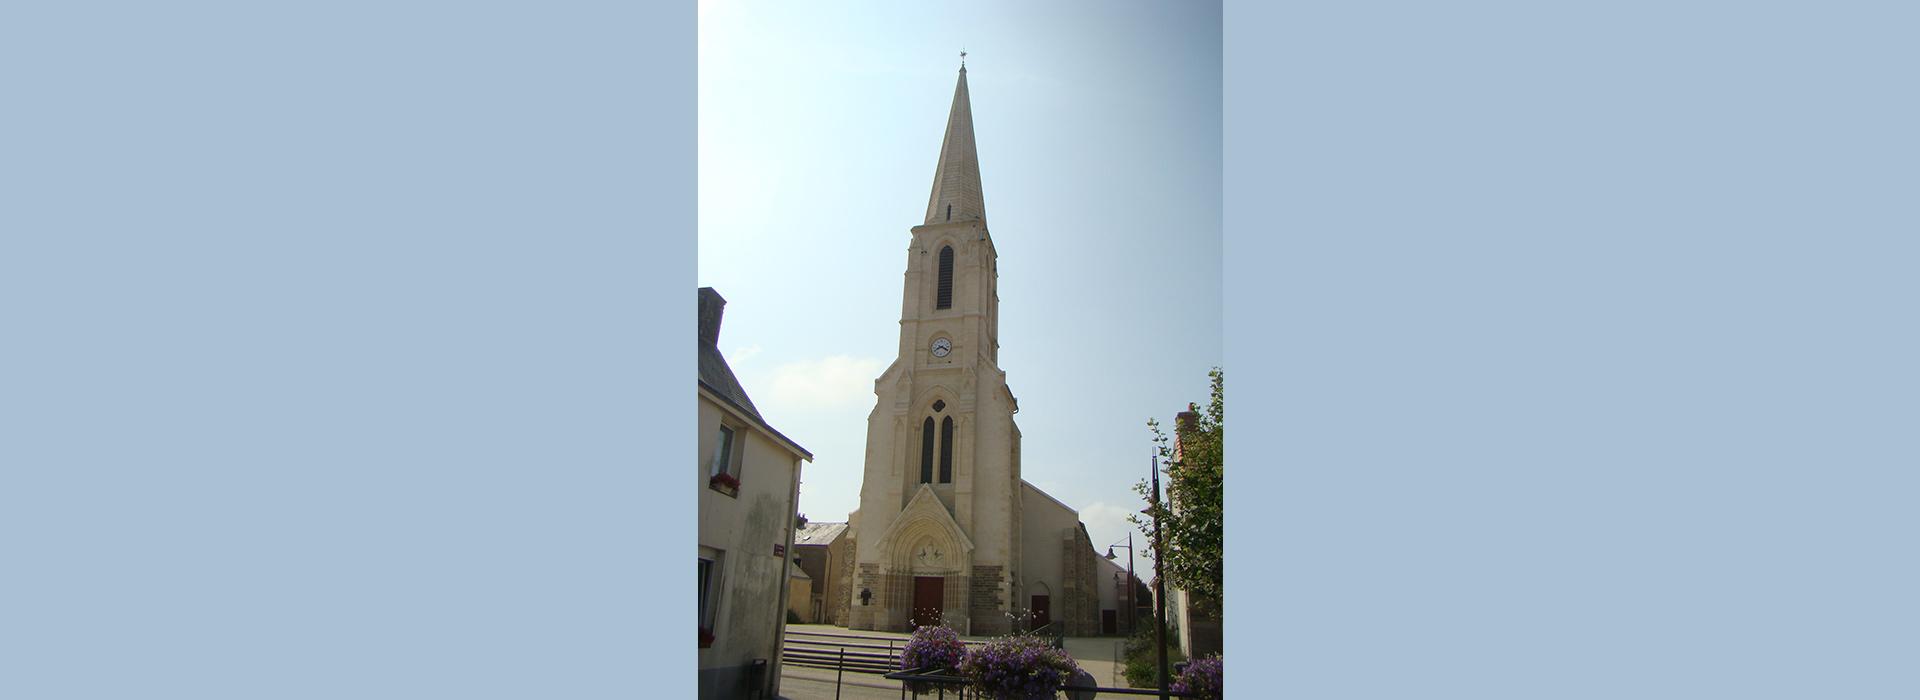 Paroisse Machecoul Eglise Bourgneuf en Retz